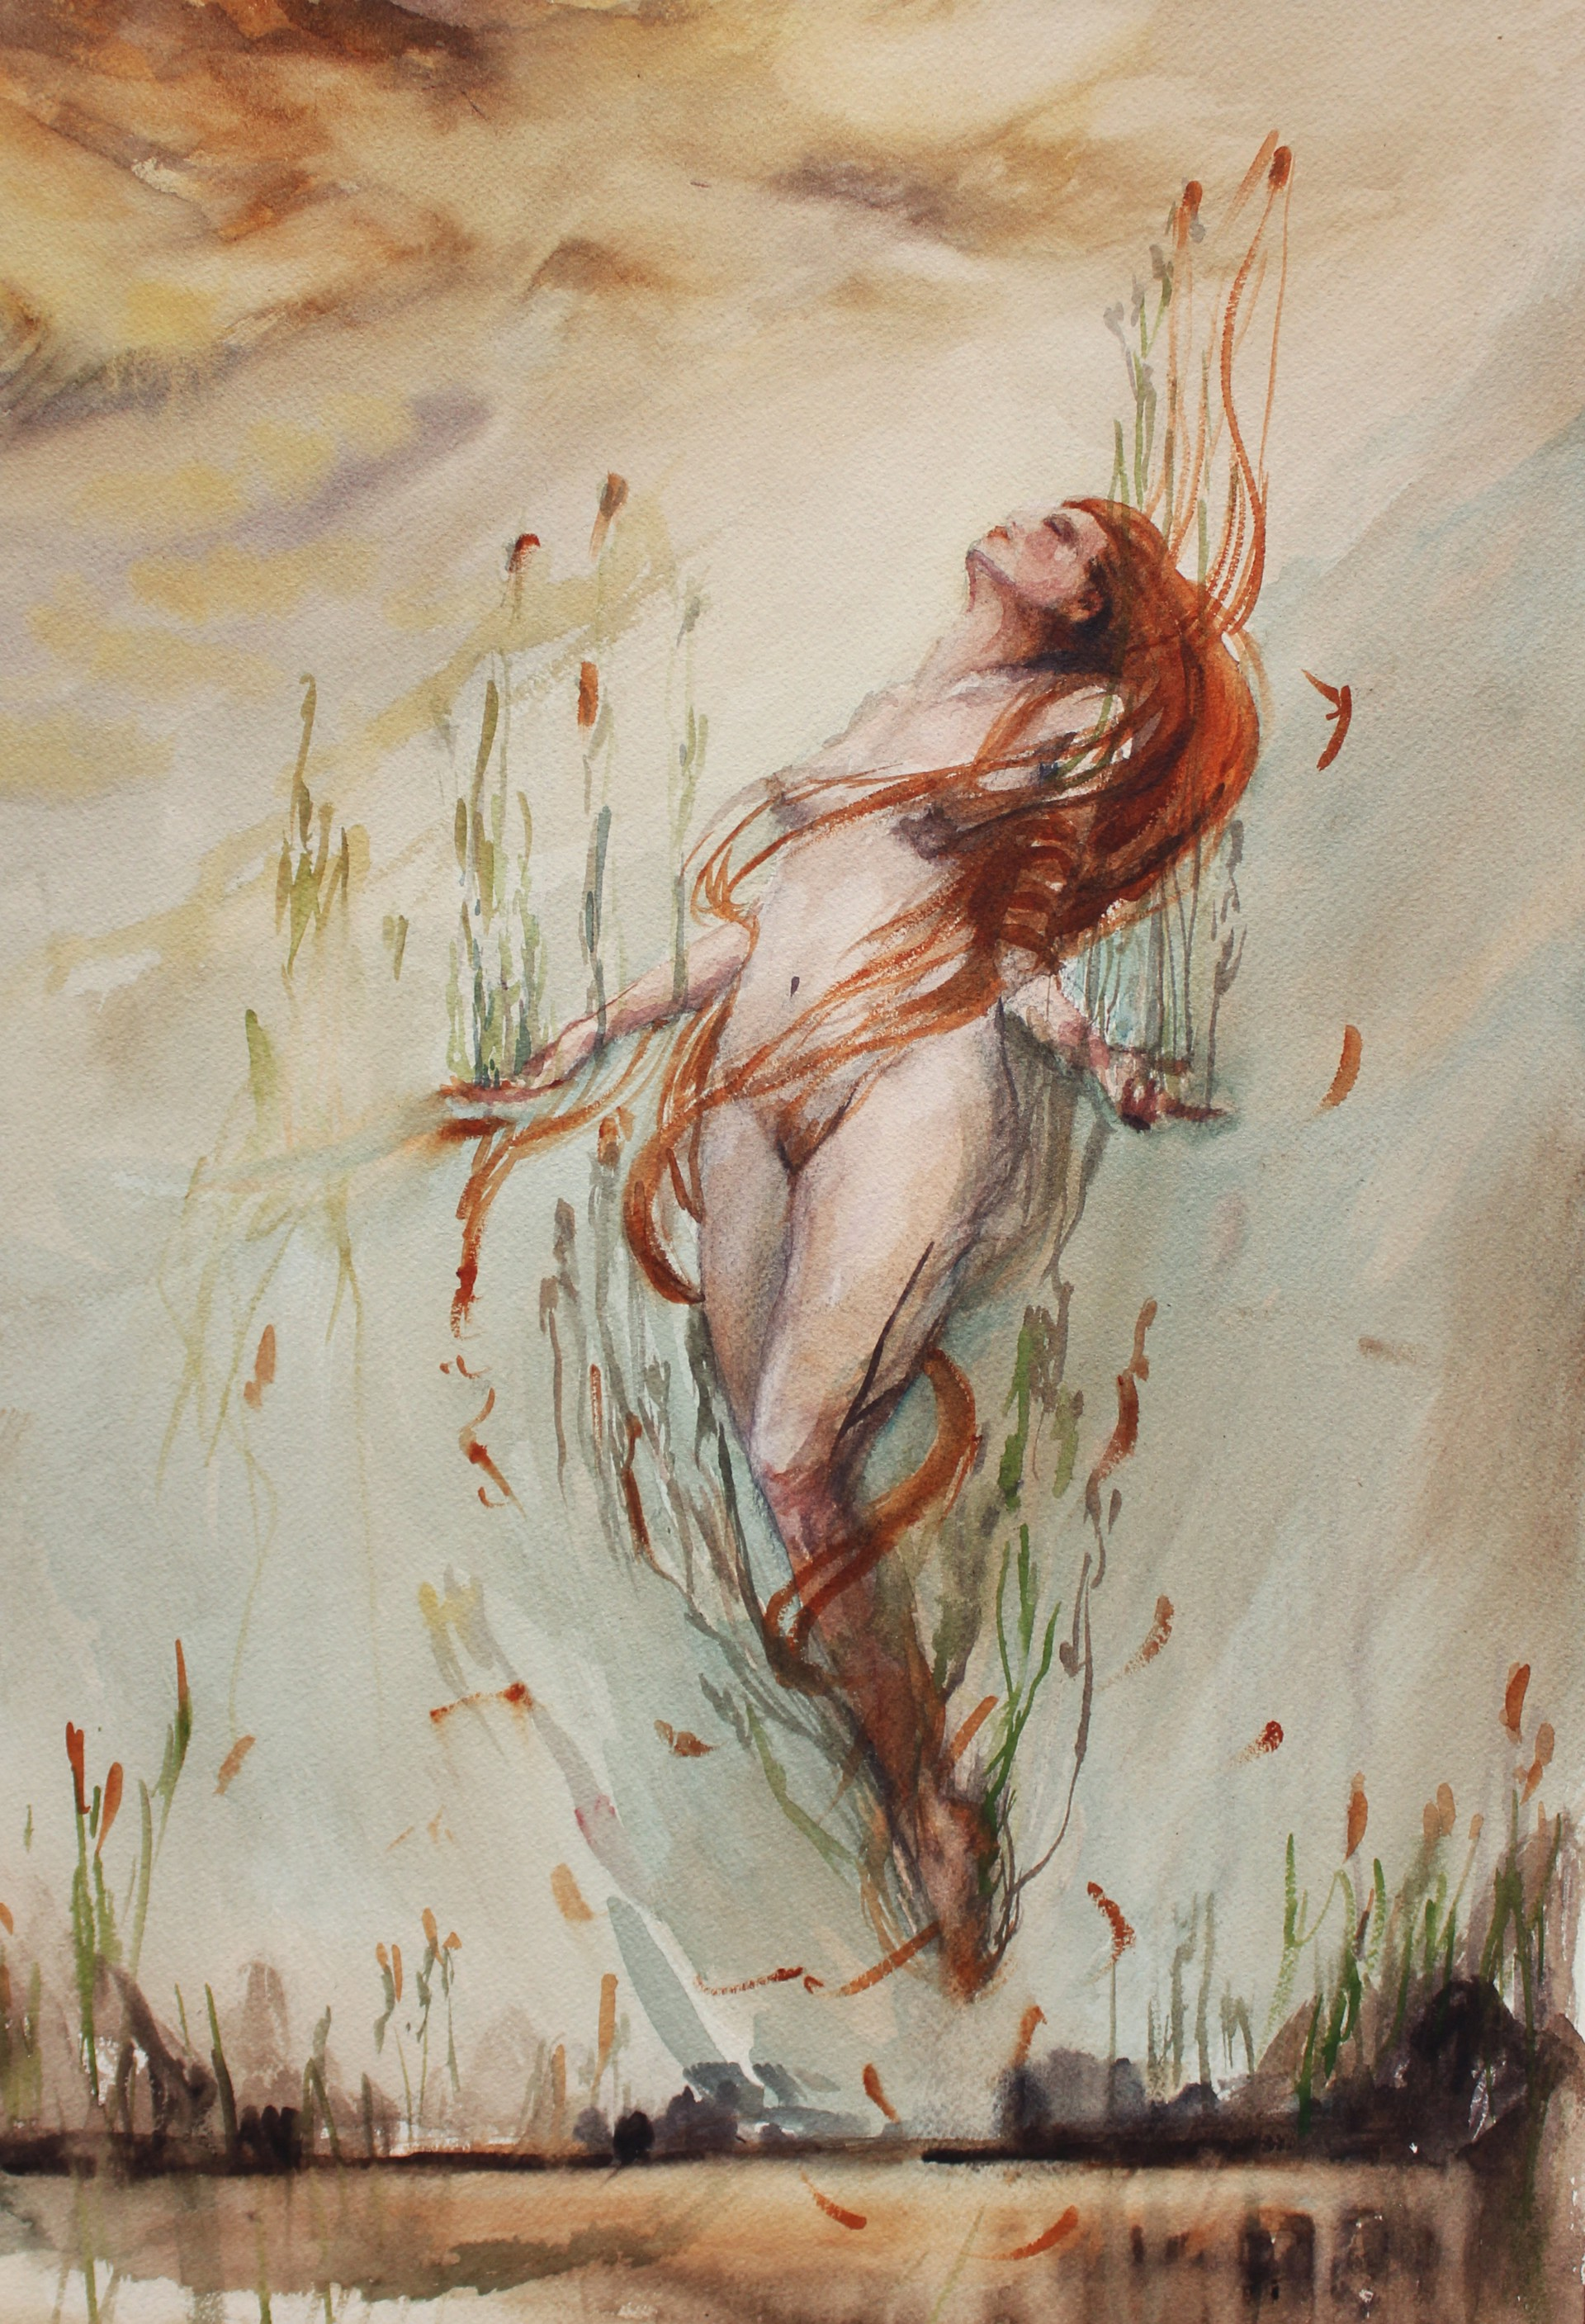 Natura by Michele Bajona